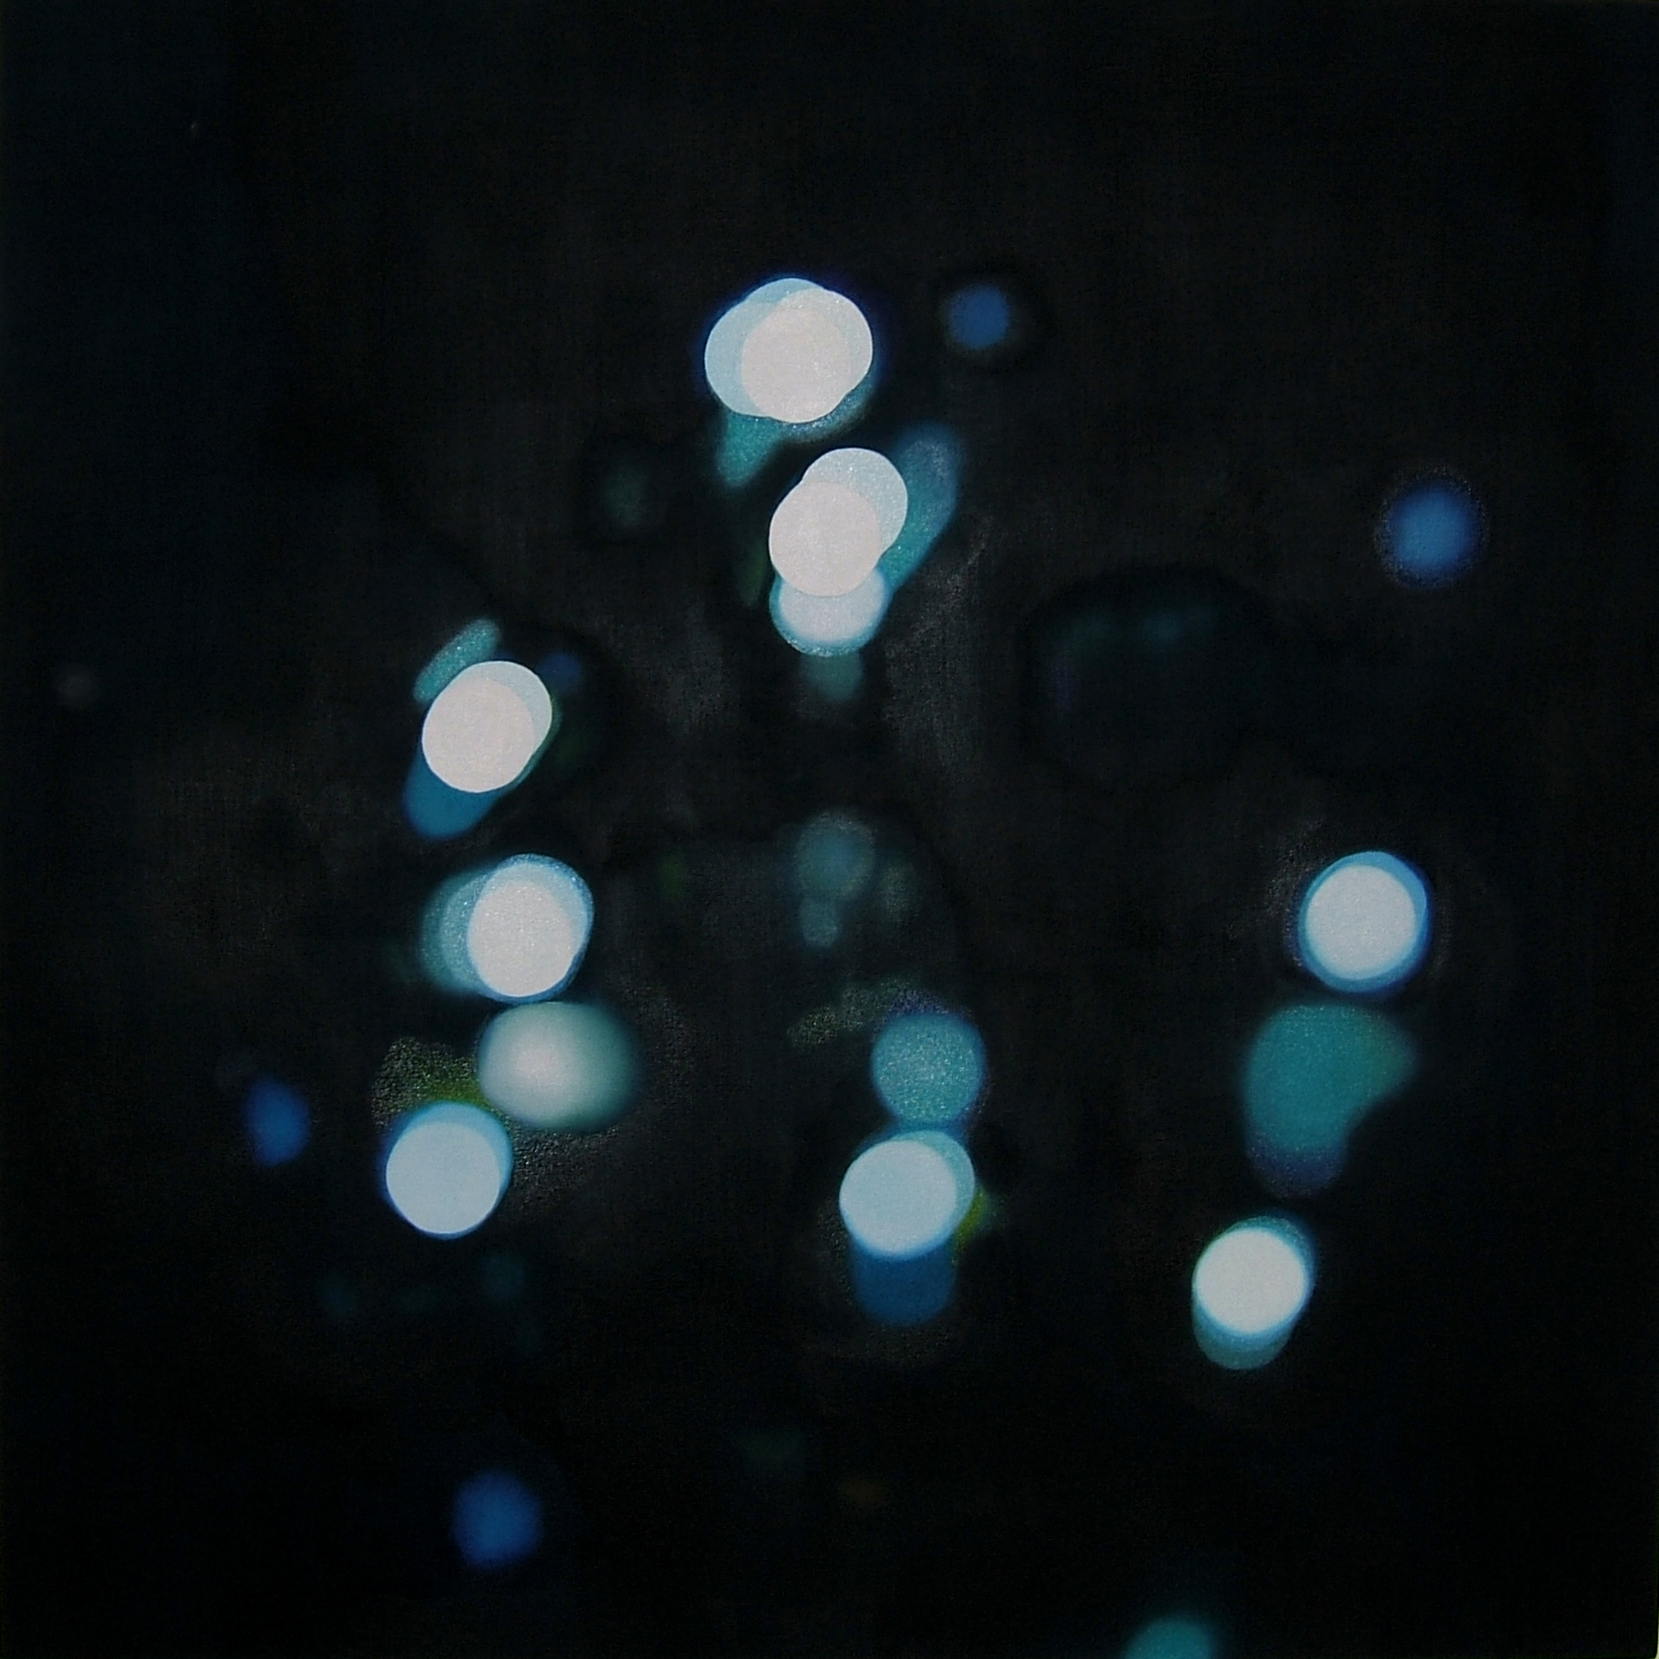 Dark Night Lights